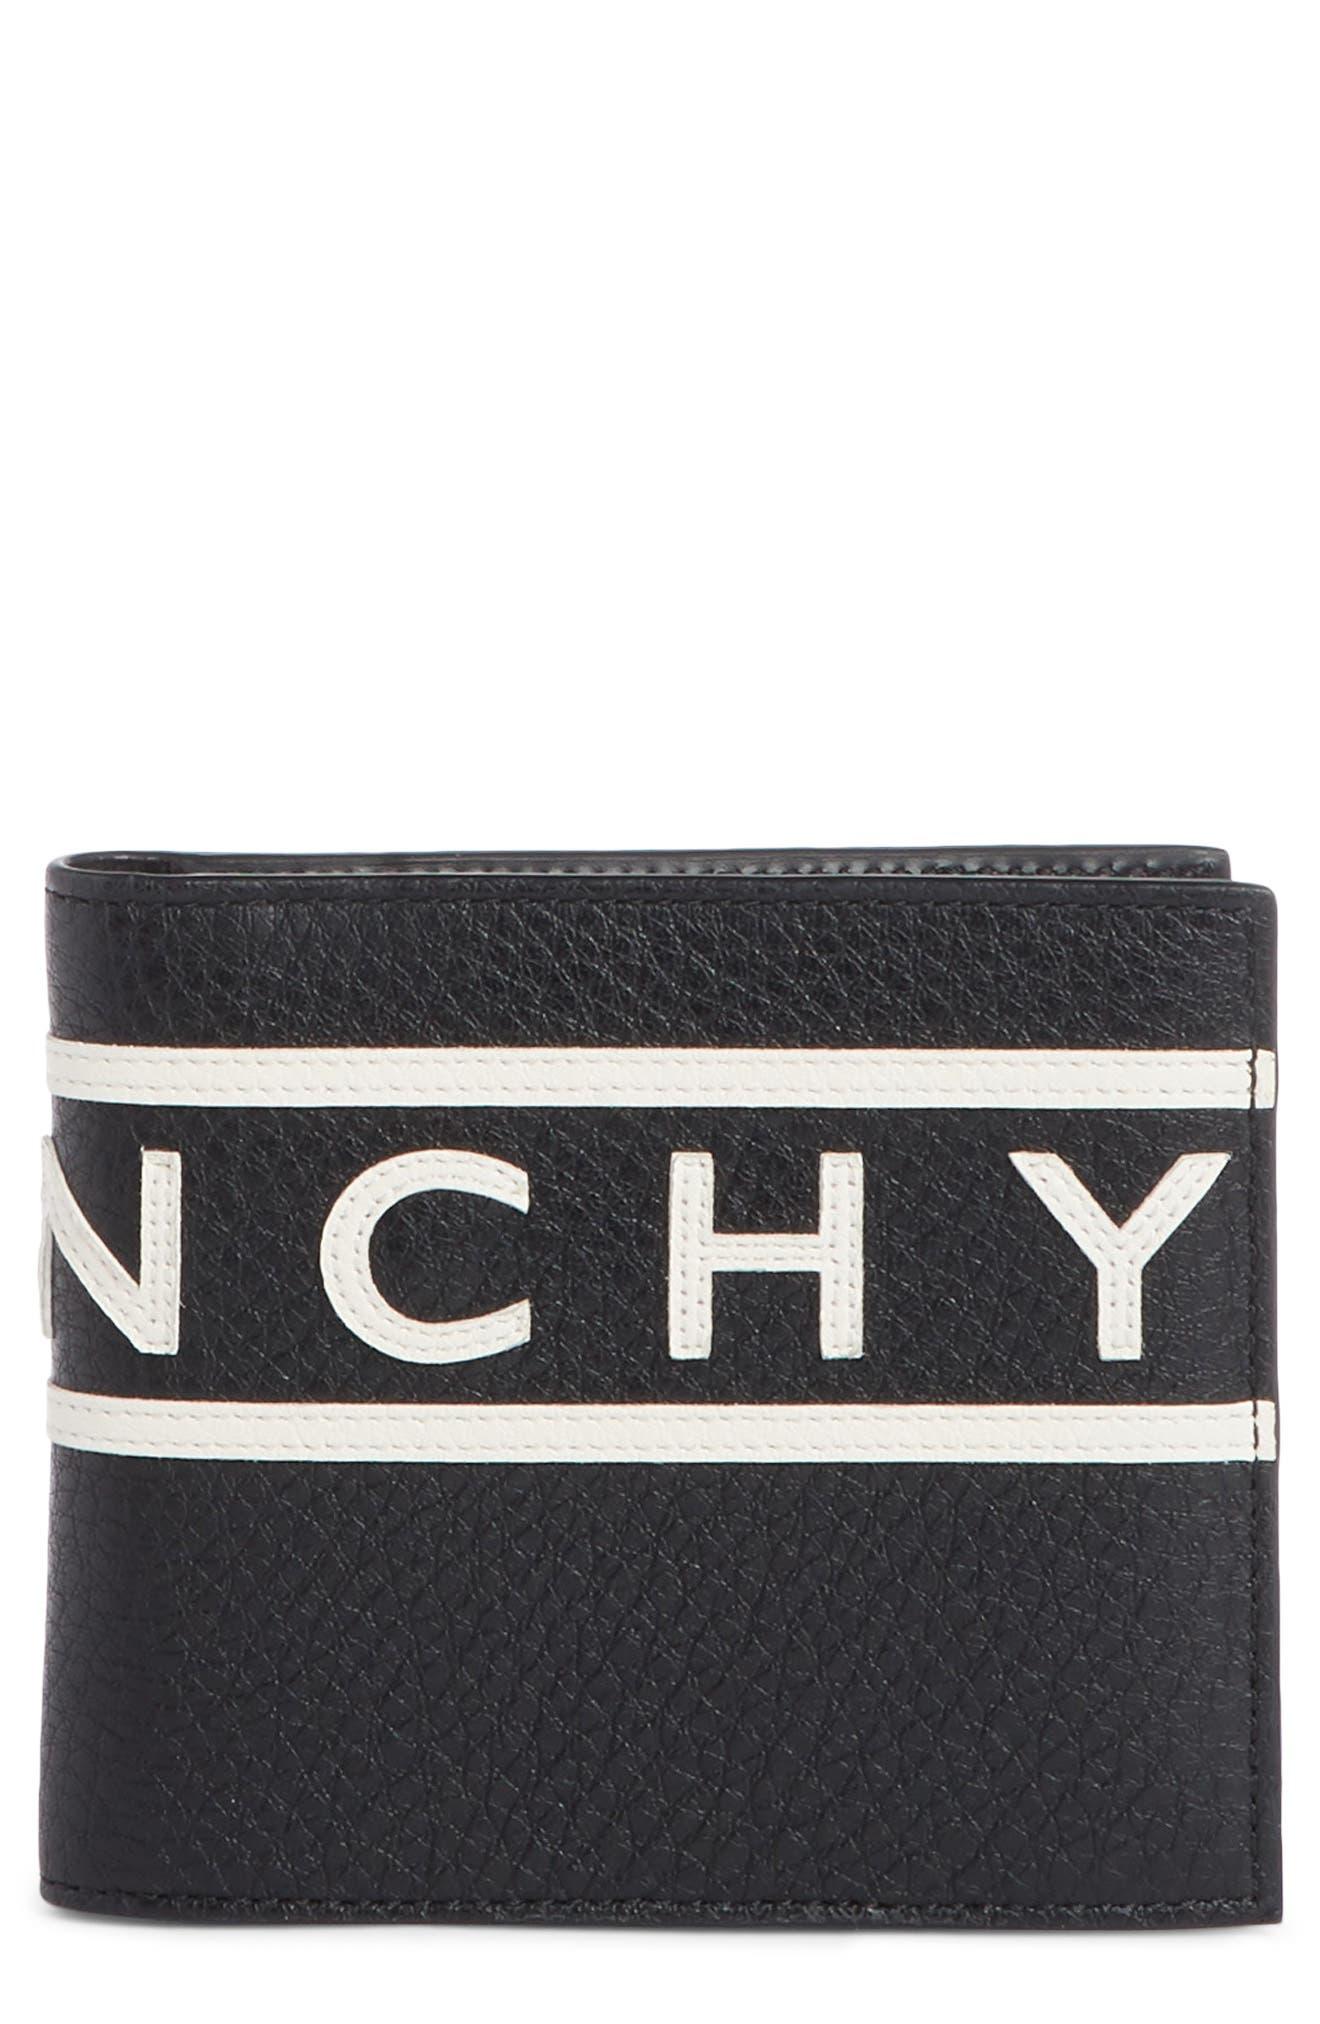 GIVENCHY,                             Logo Calfskin Leather Wallet,                             Main thumbnail 1, color,                             BLACK